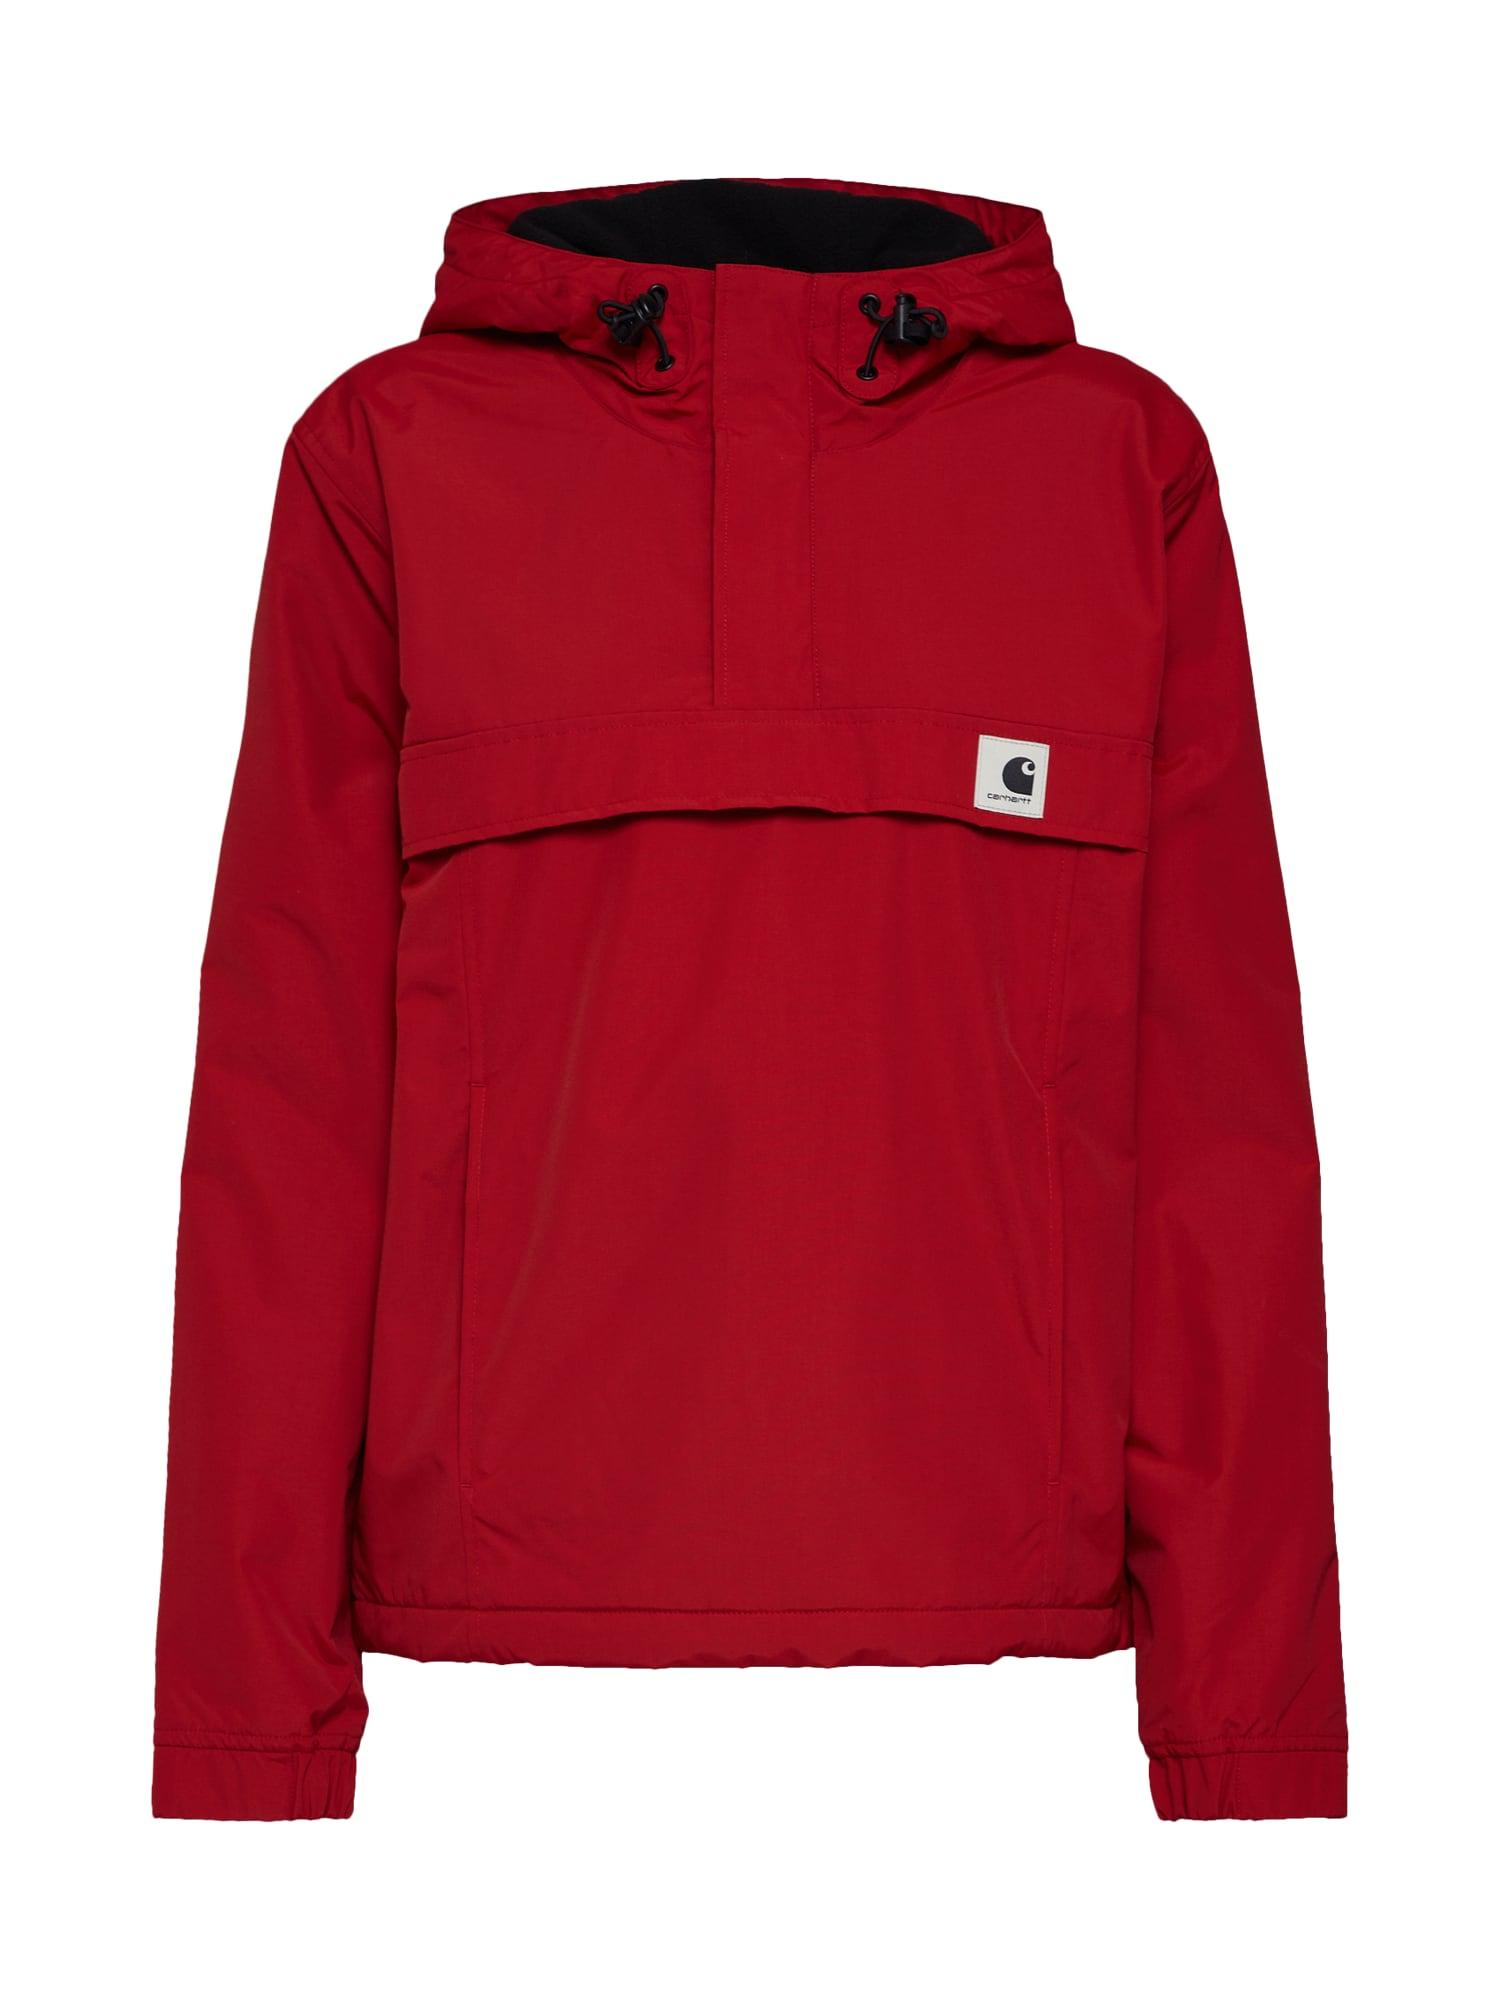 Přechodná bunda Nimbus červená bílá Carhartt WIP